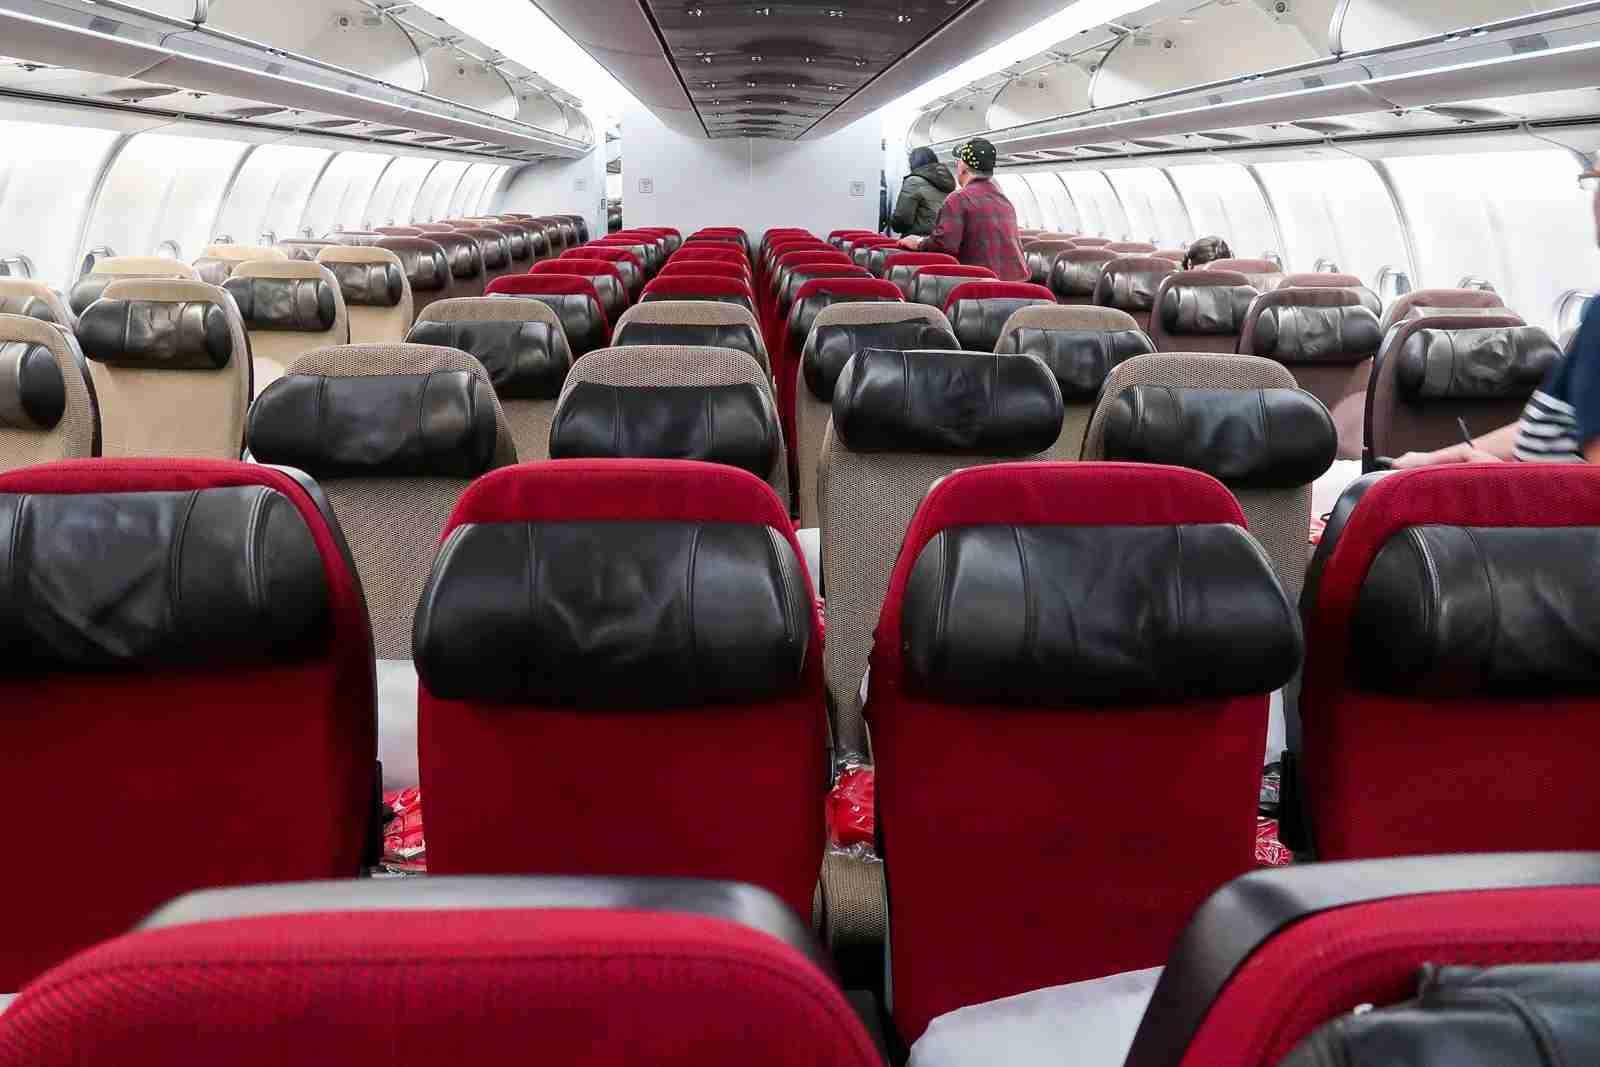 Virgin Atlantic A340 economy seats (Photo by Ben Smithson/The Points Guy)